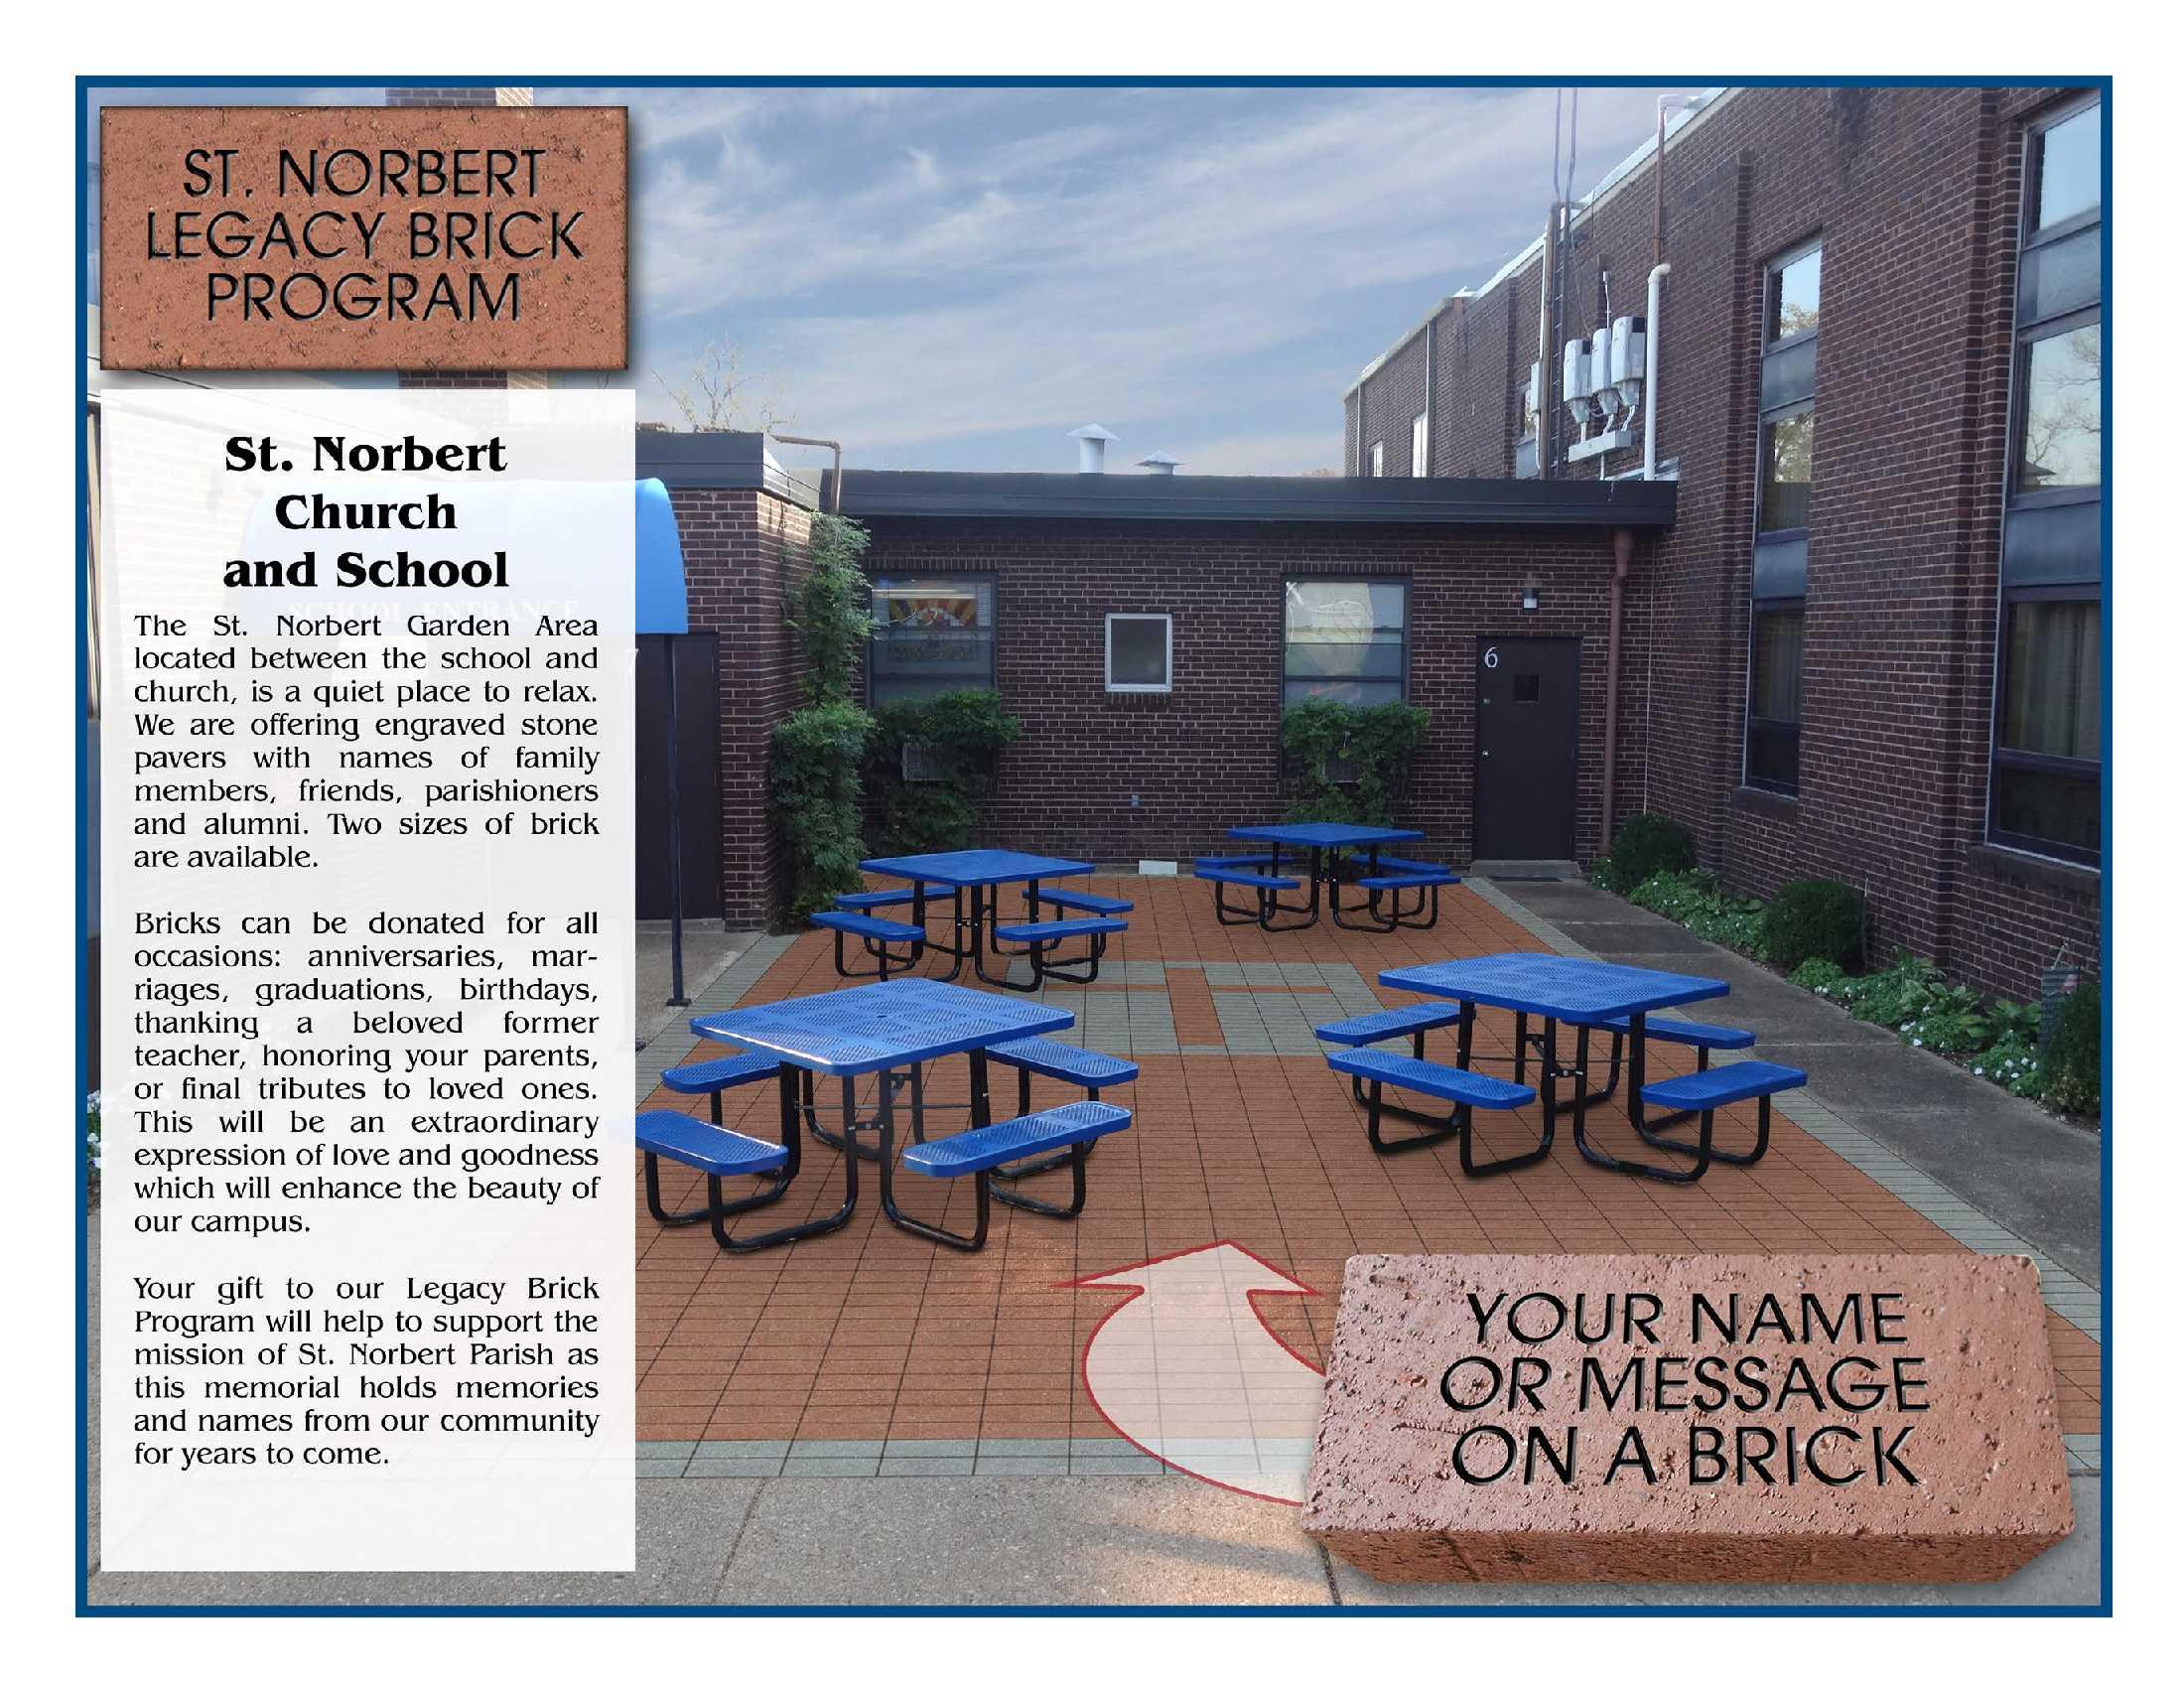 St Norbert Campus Map.St Norbert Giving